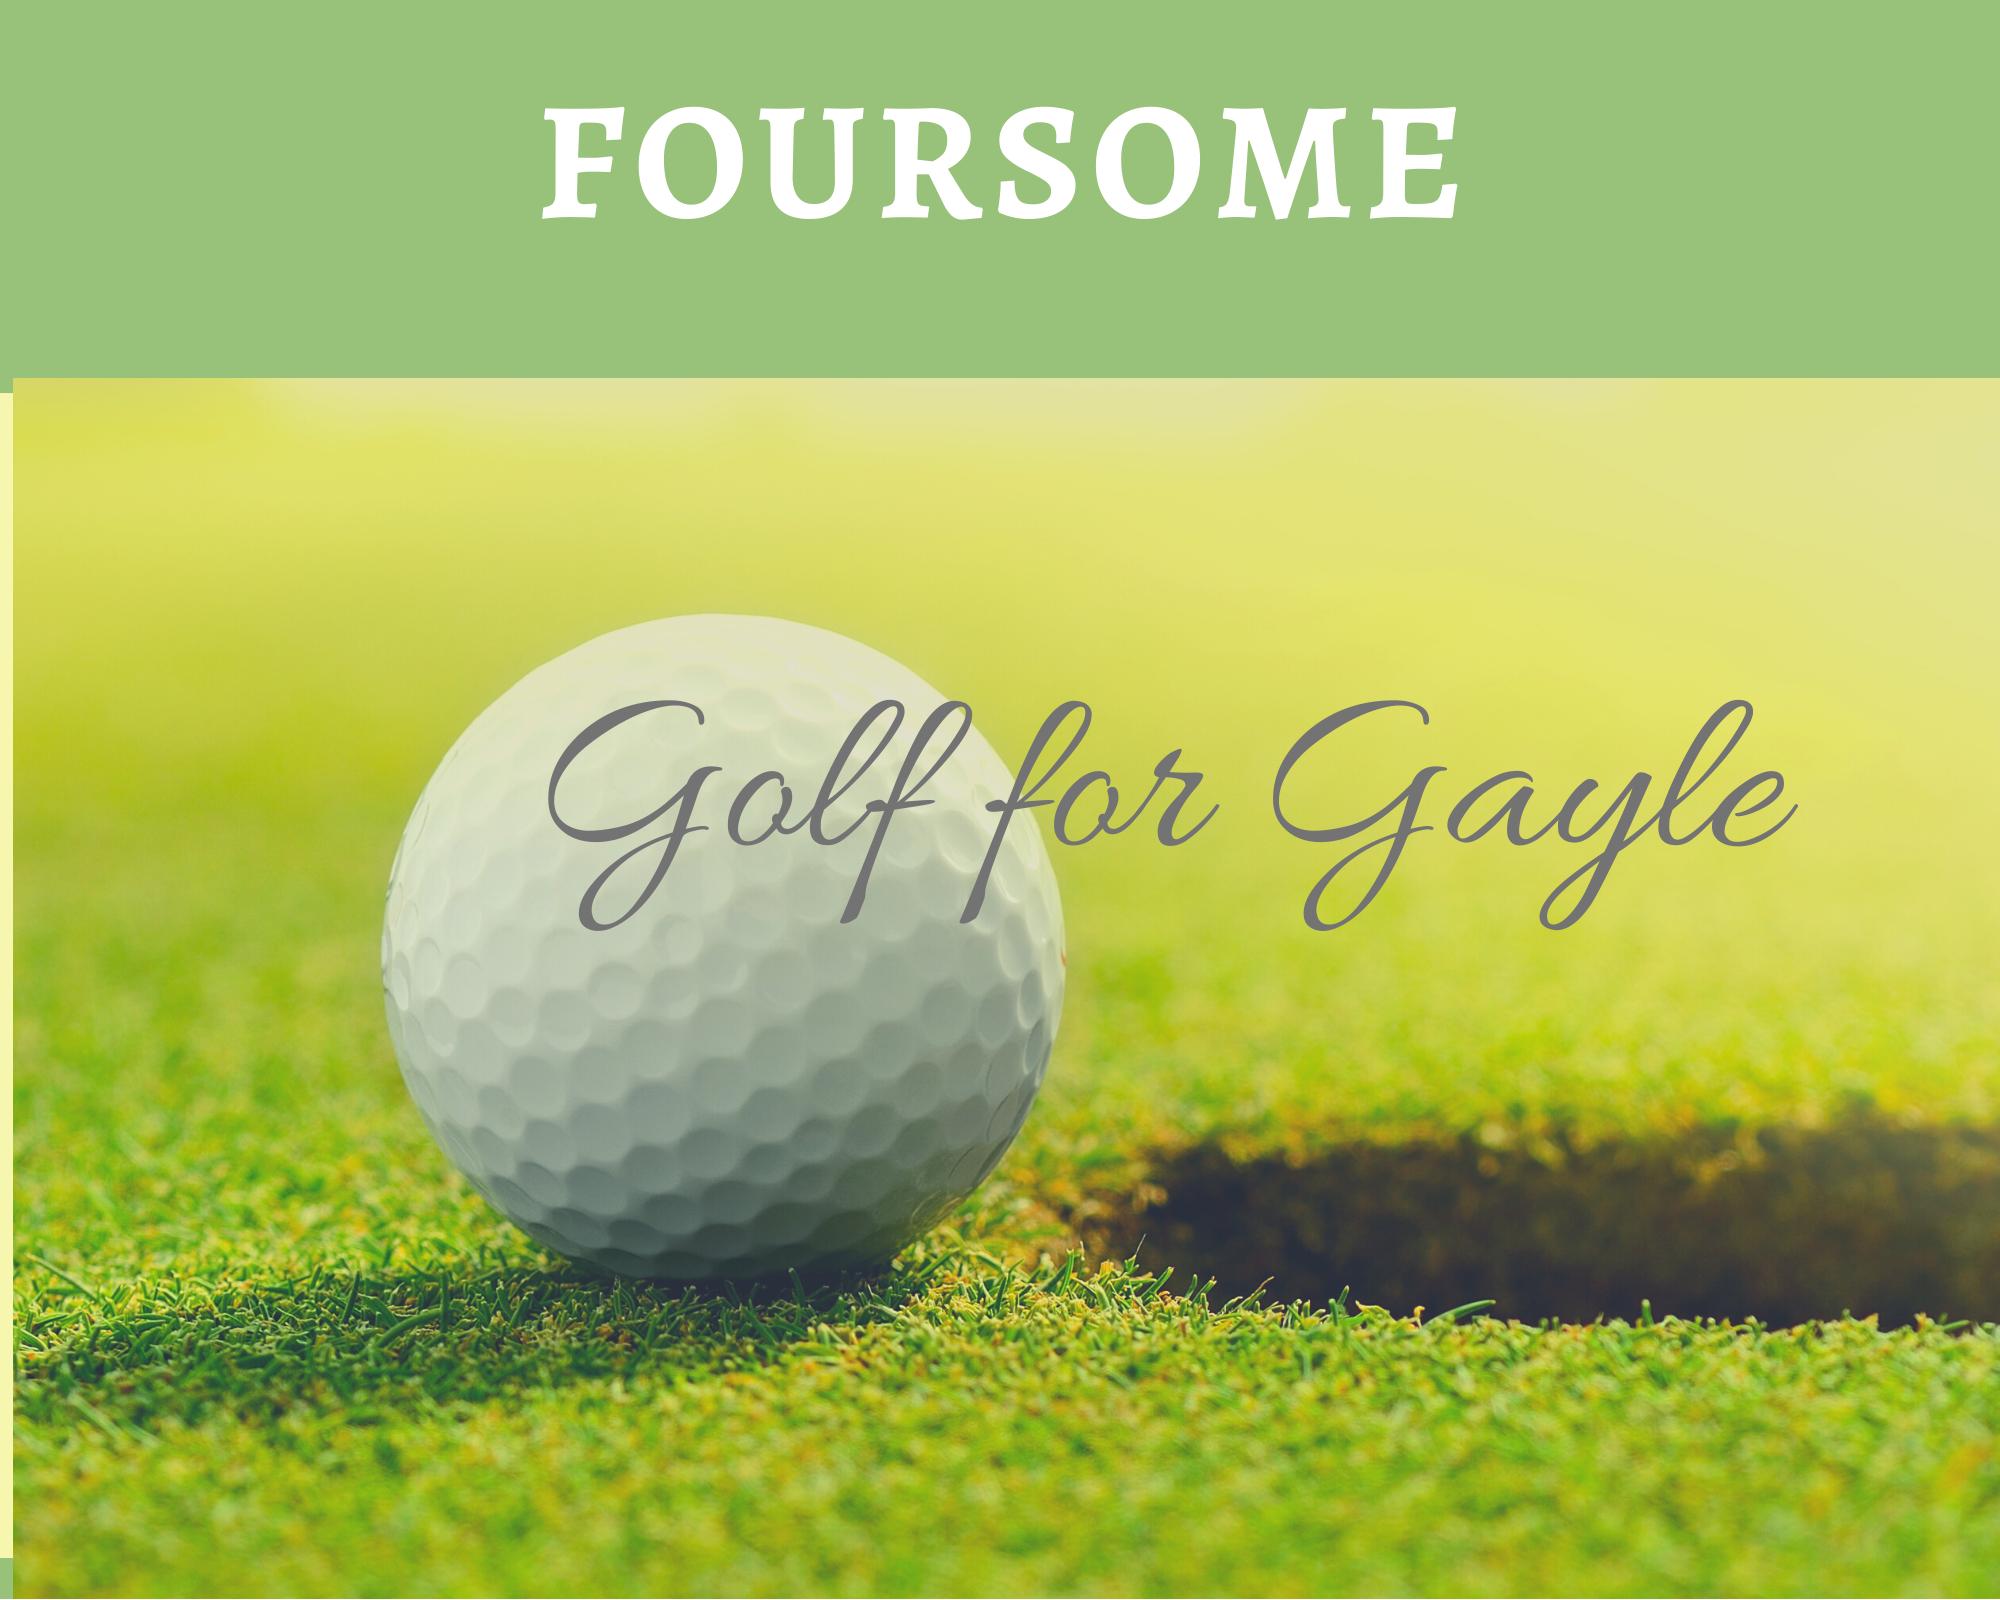 Gayle Newgren Charity Golf Tournament 2021 - Default Image of Foursome